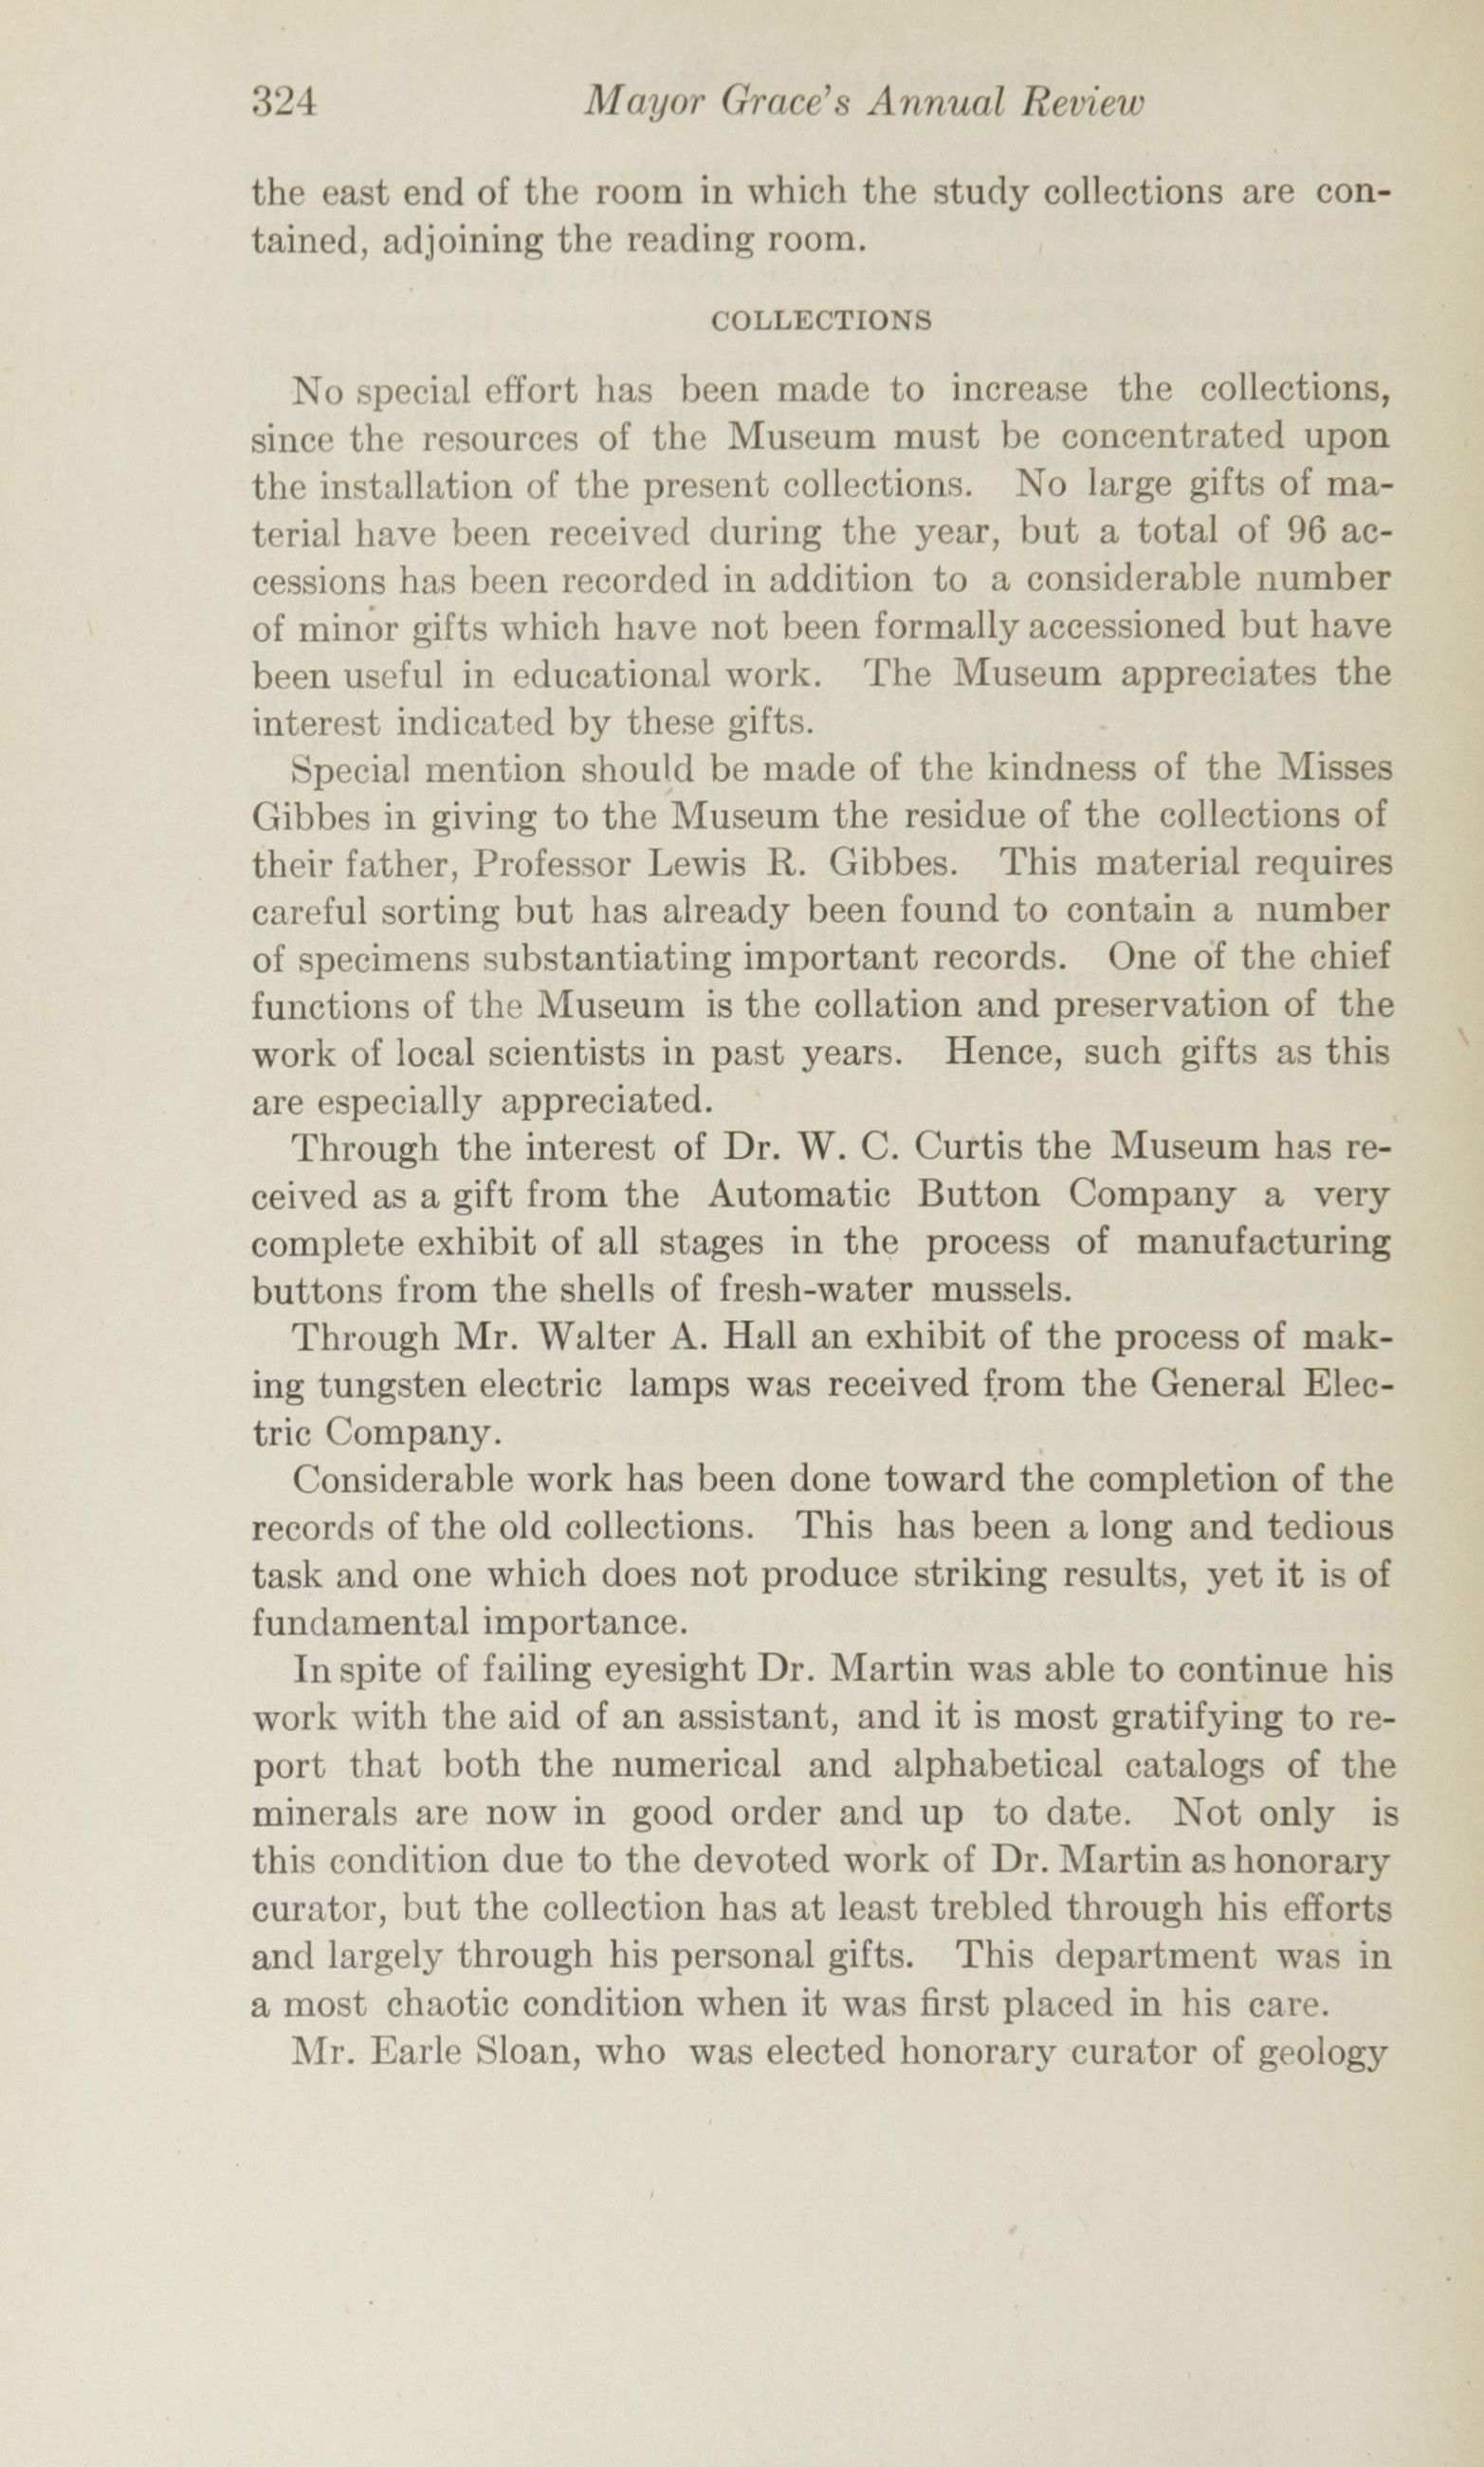 Charleston Yearbook, 1915, page 324